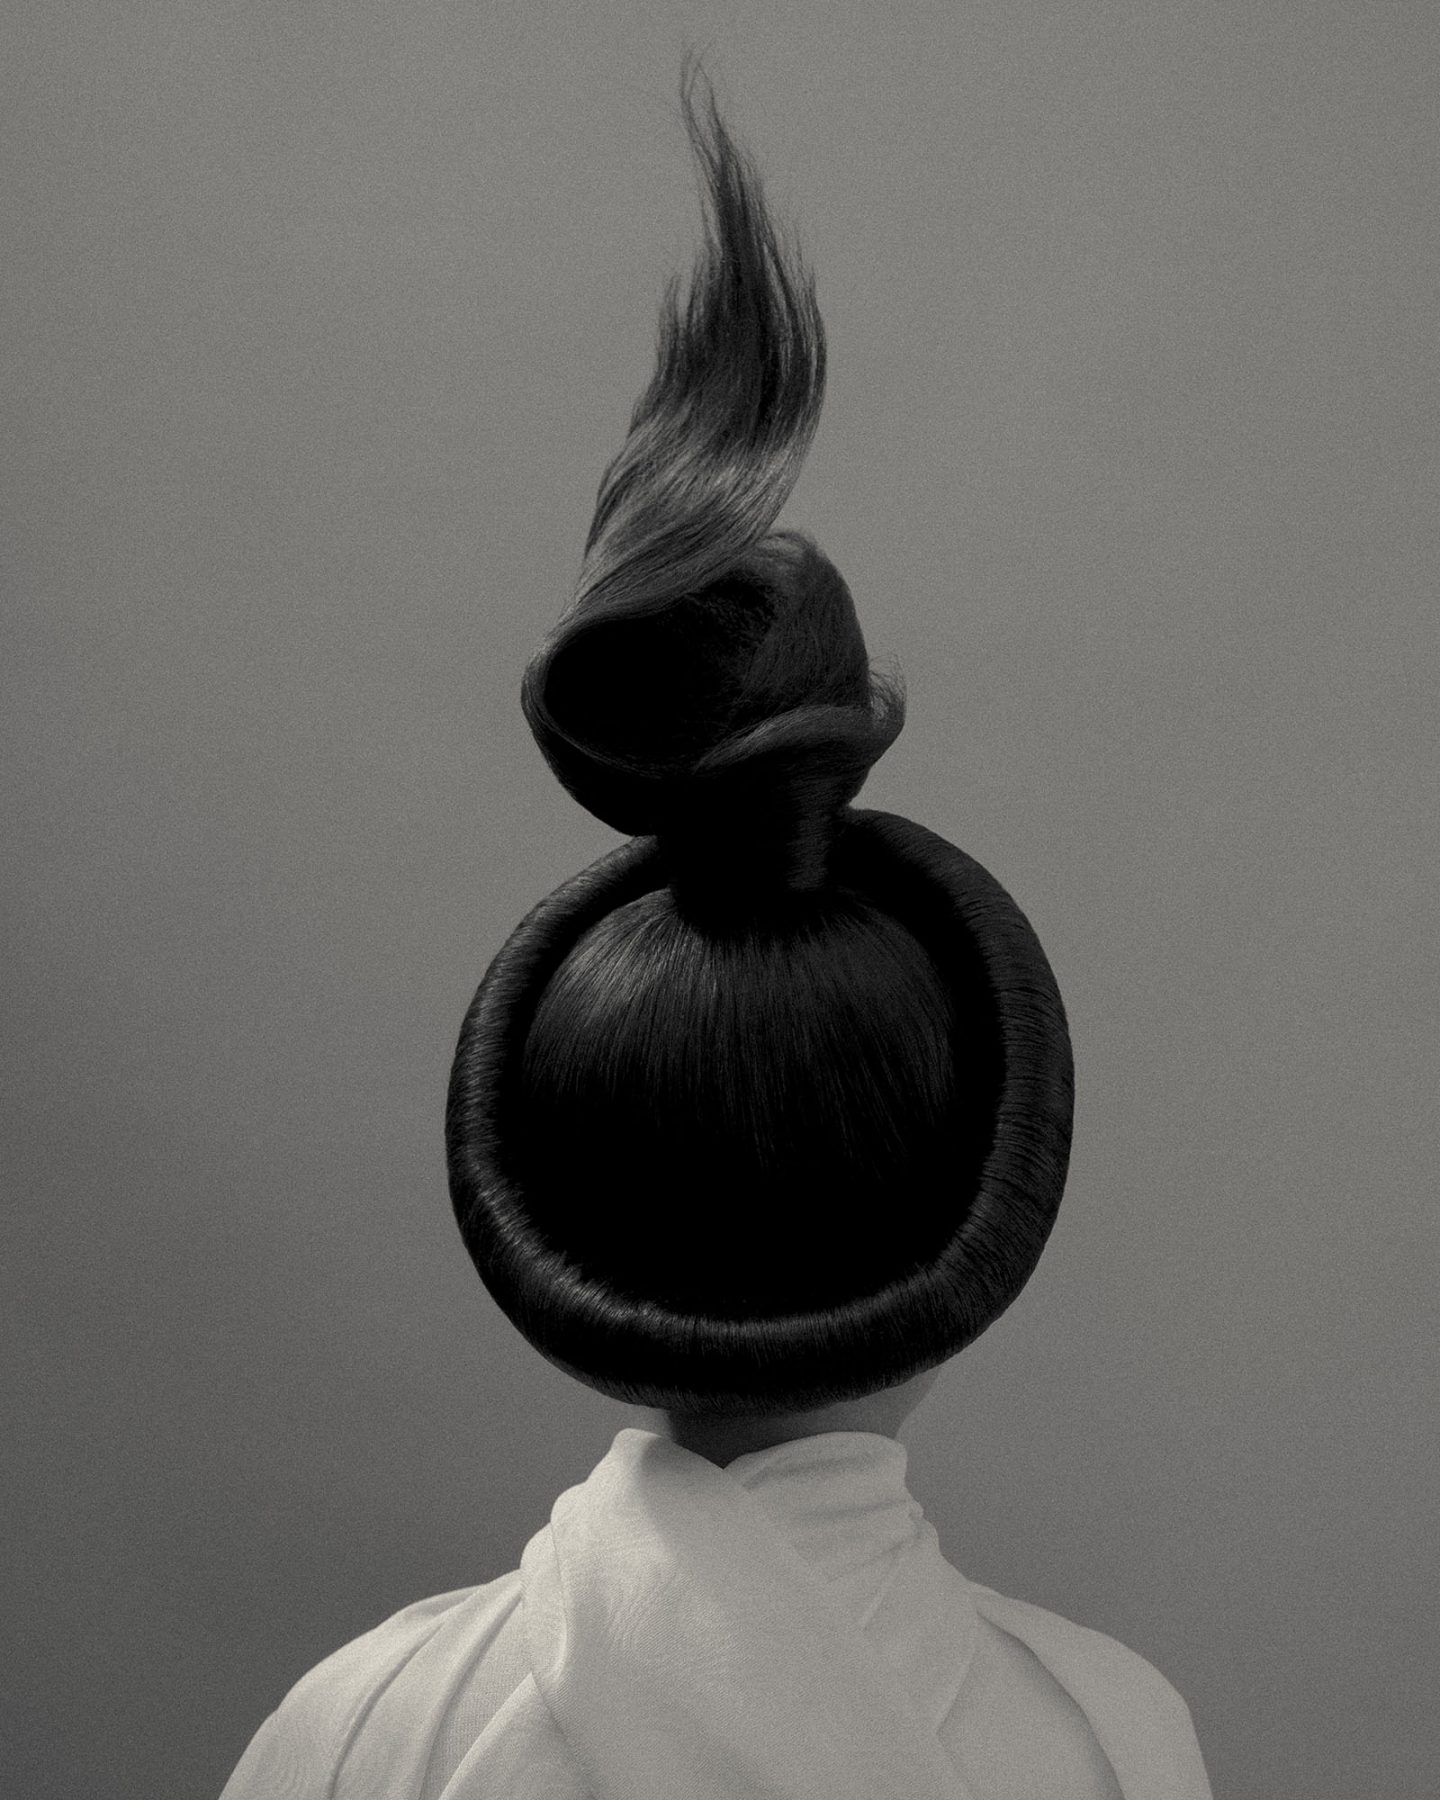 IGNANT-Photography-Paul-Phung-Toufa-Hair-04